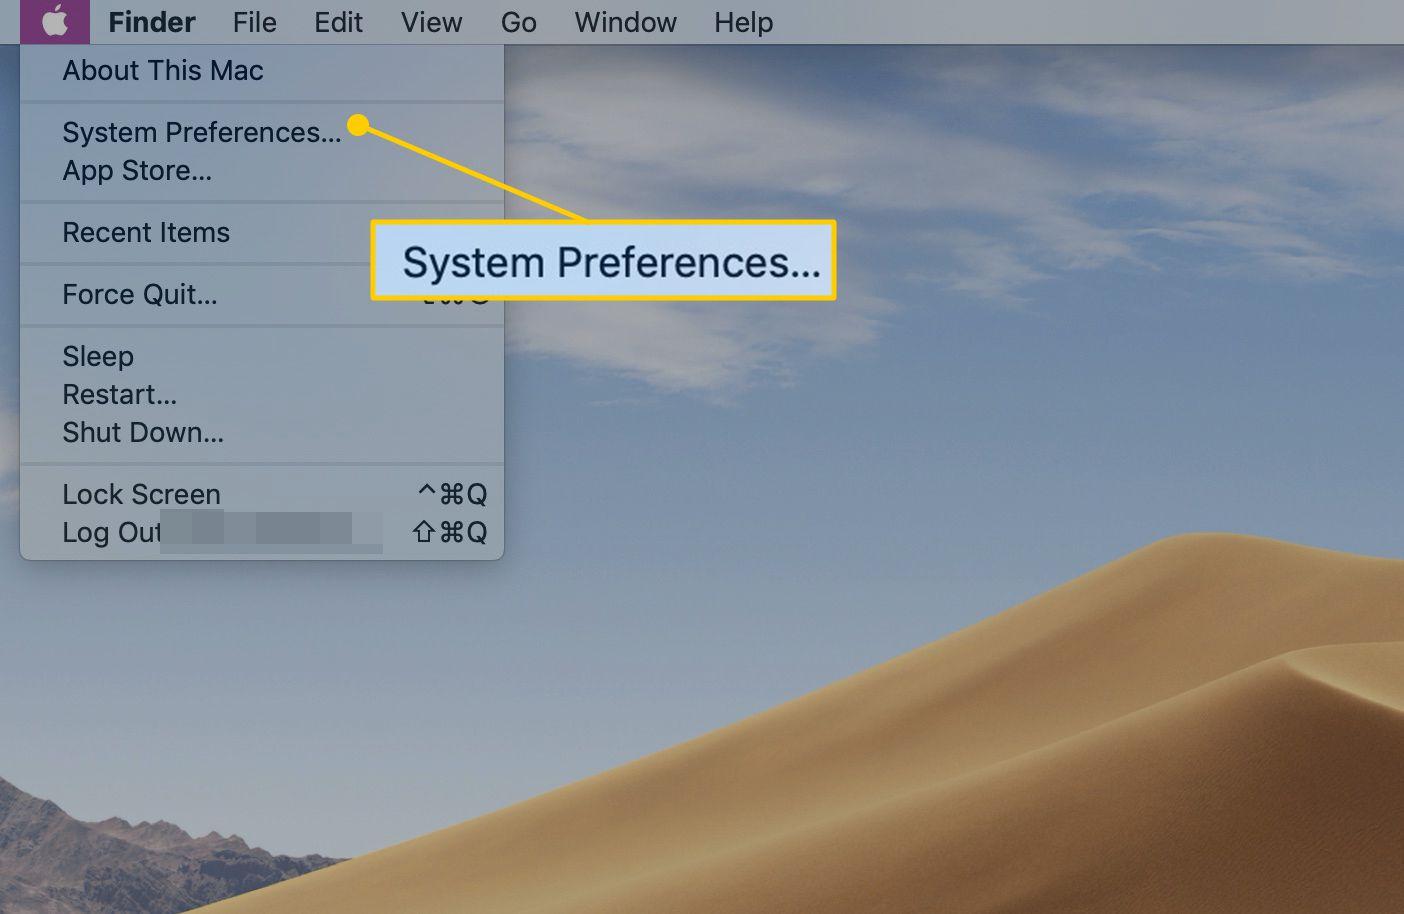 System Preferences menu item in macOS